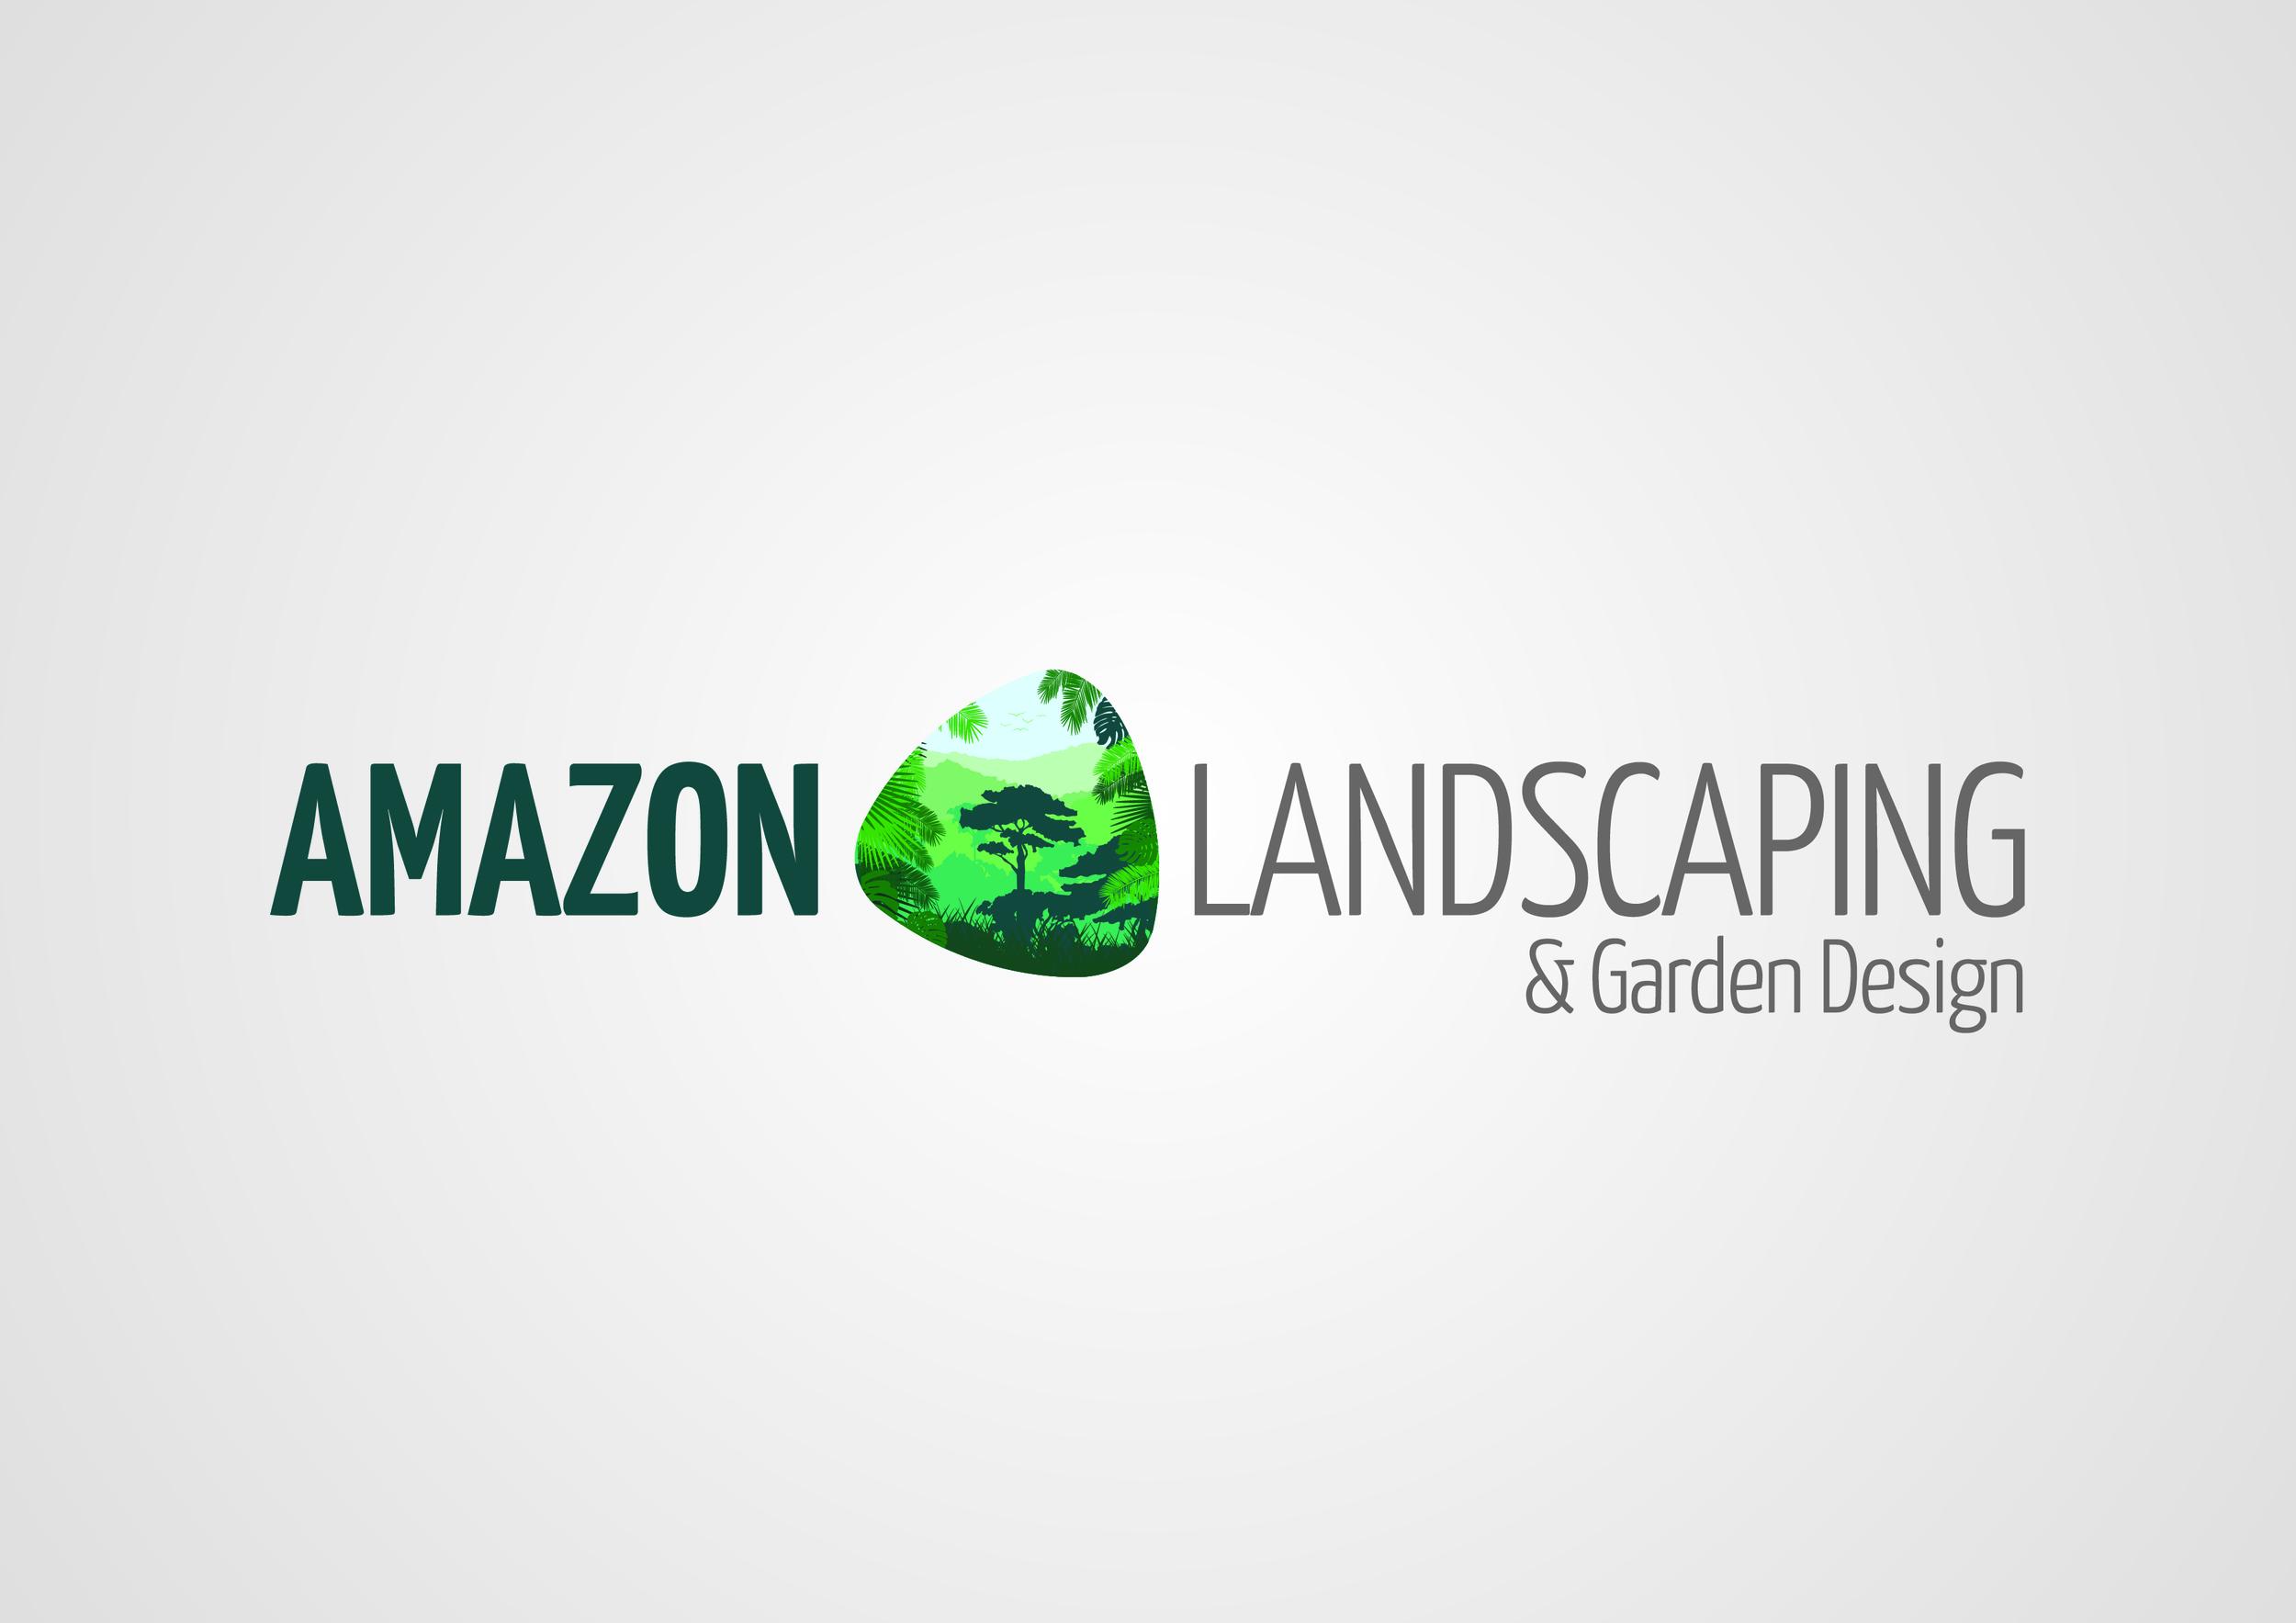 Amazon Landscapers